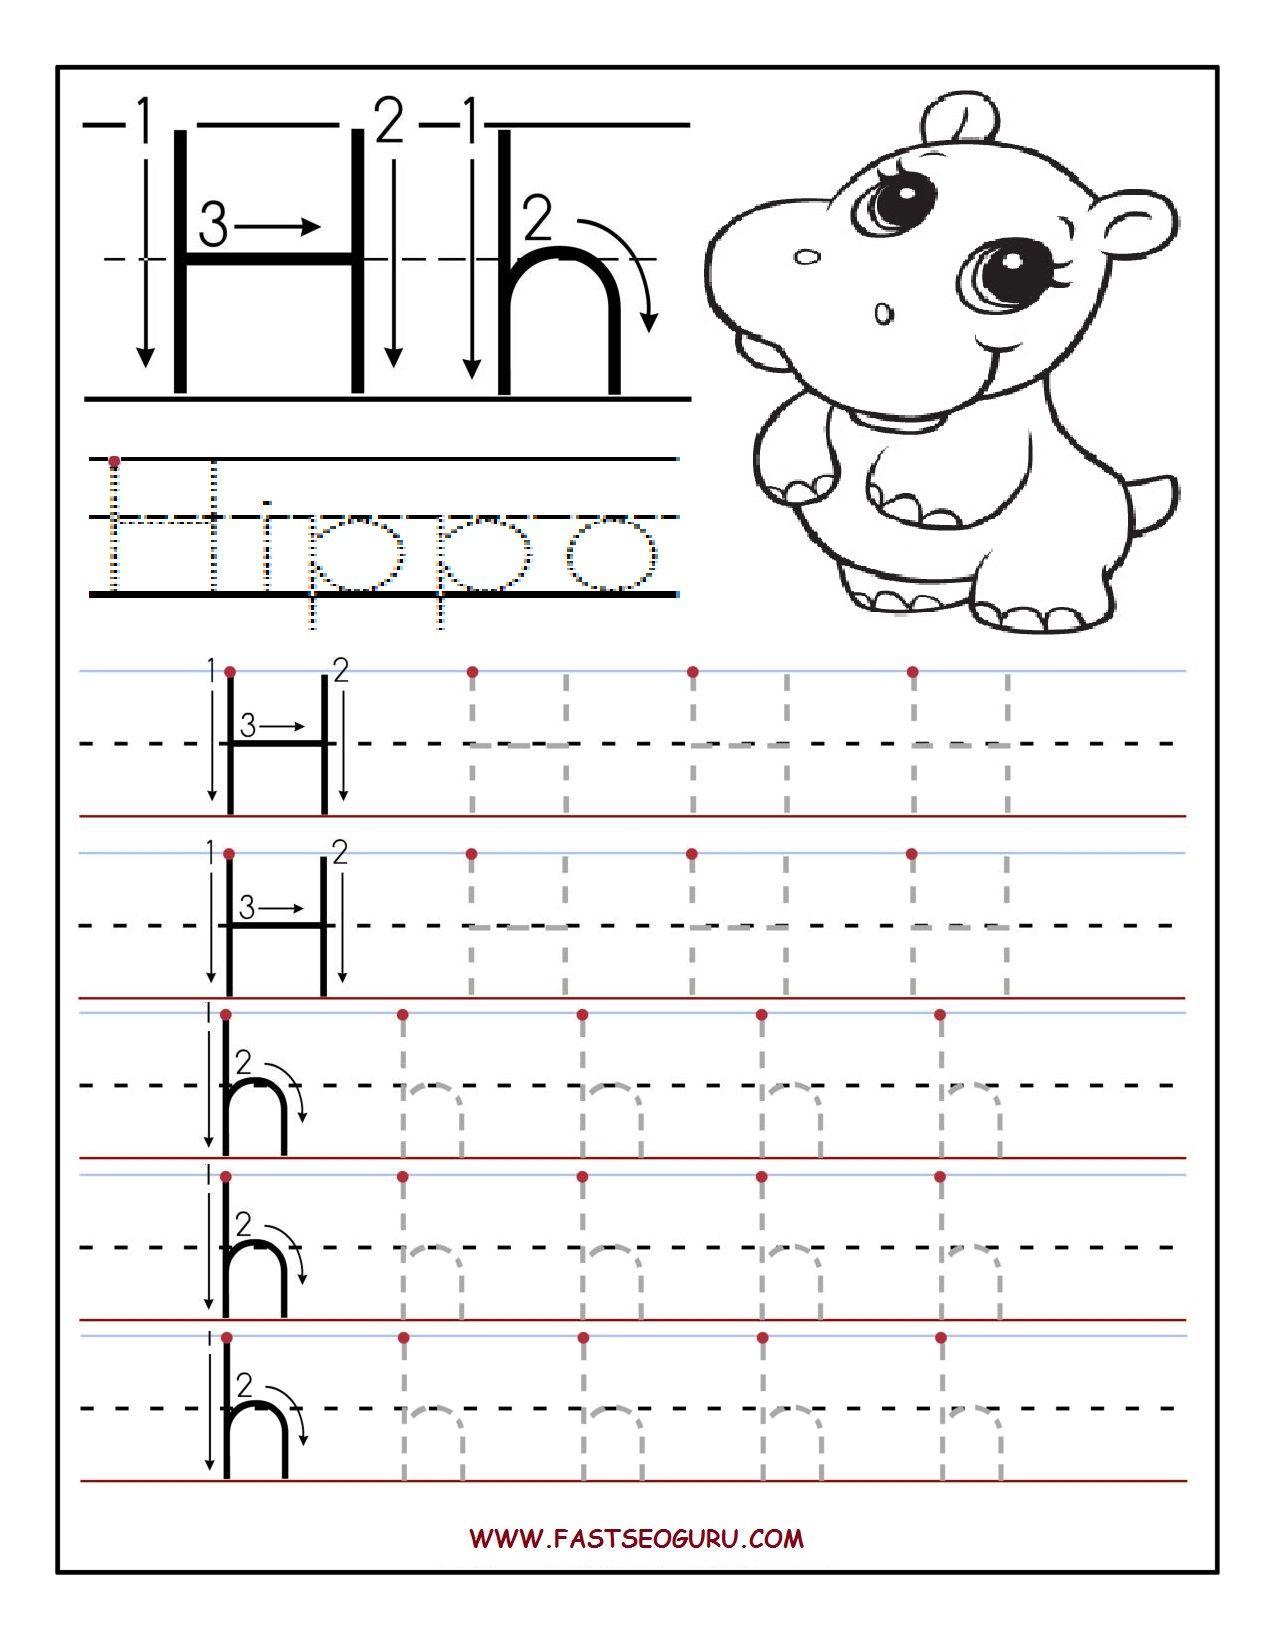 Pinangelika Opoka On Letter H Preschool Activities inside Letter H Tracing Sheet